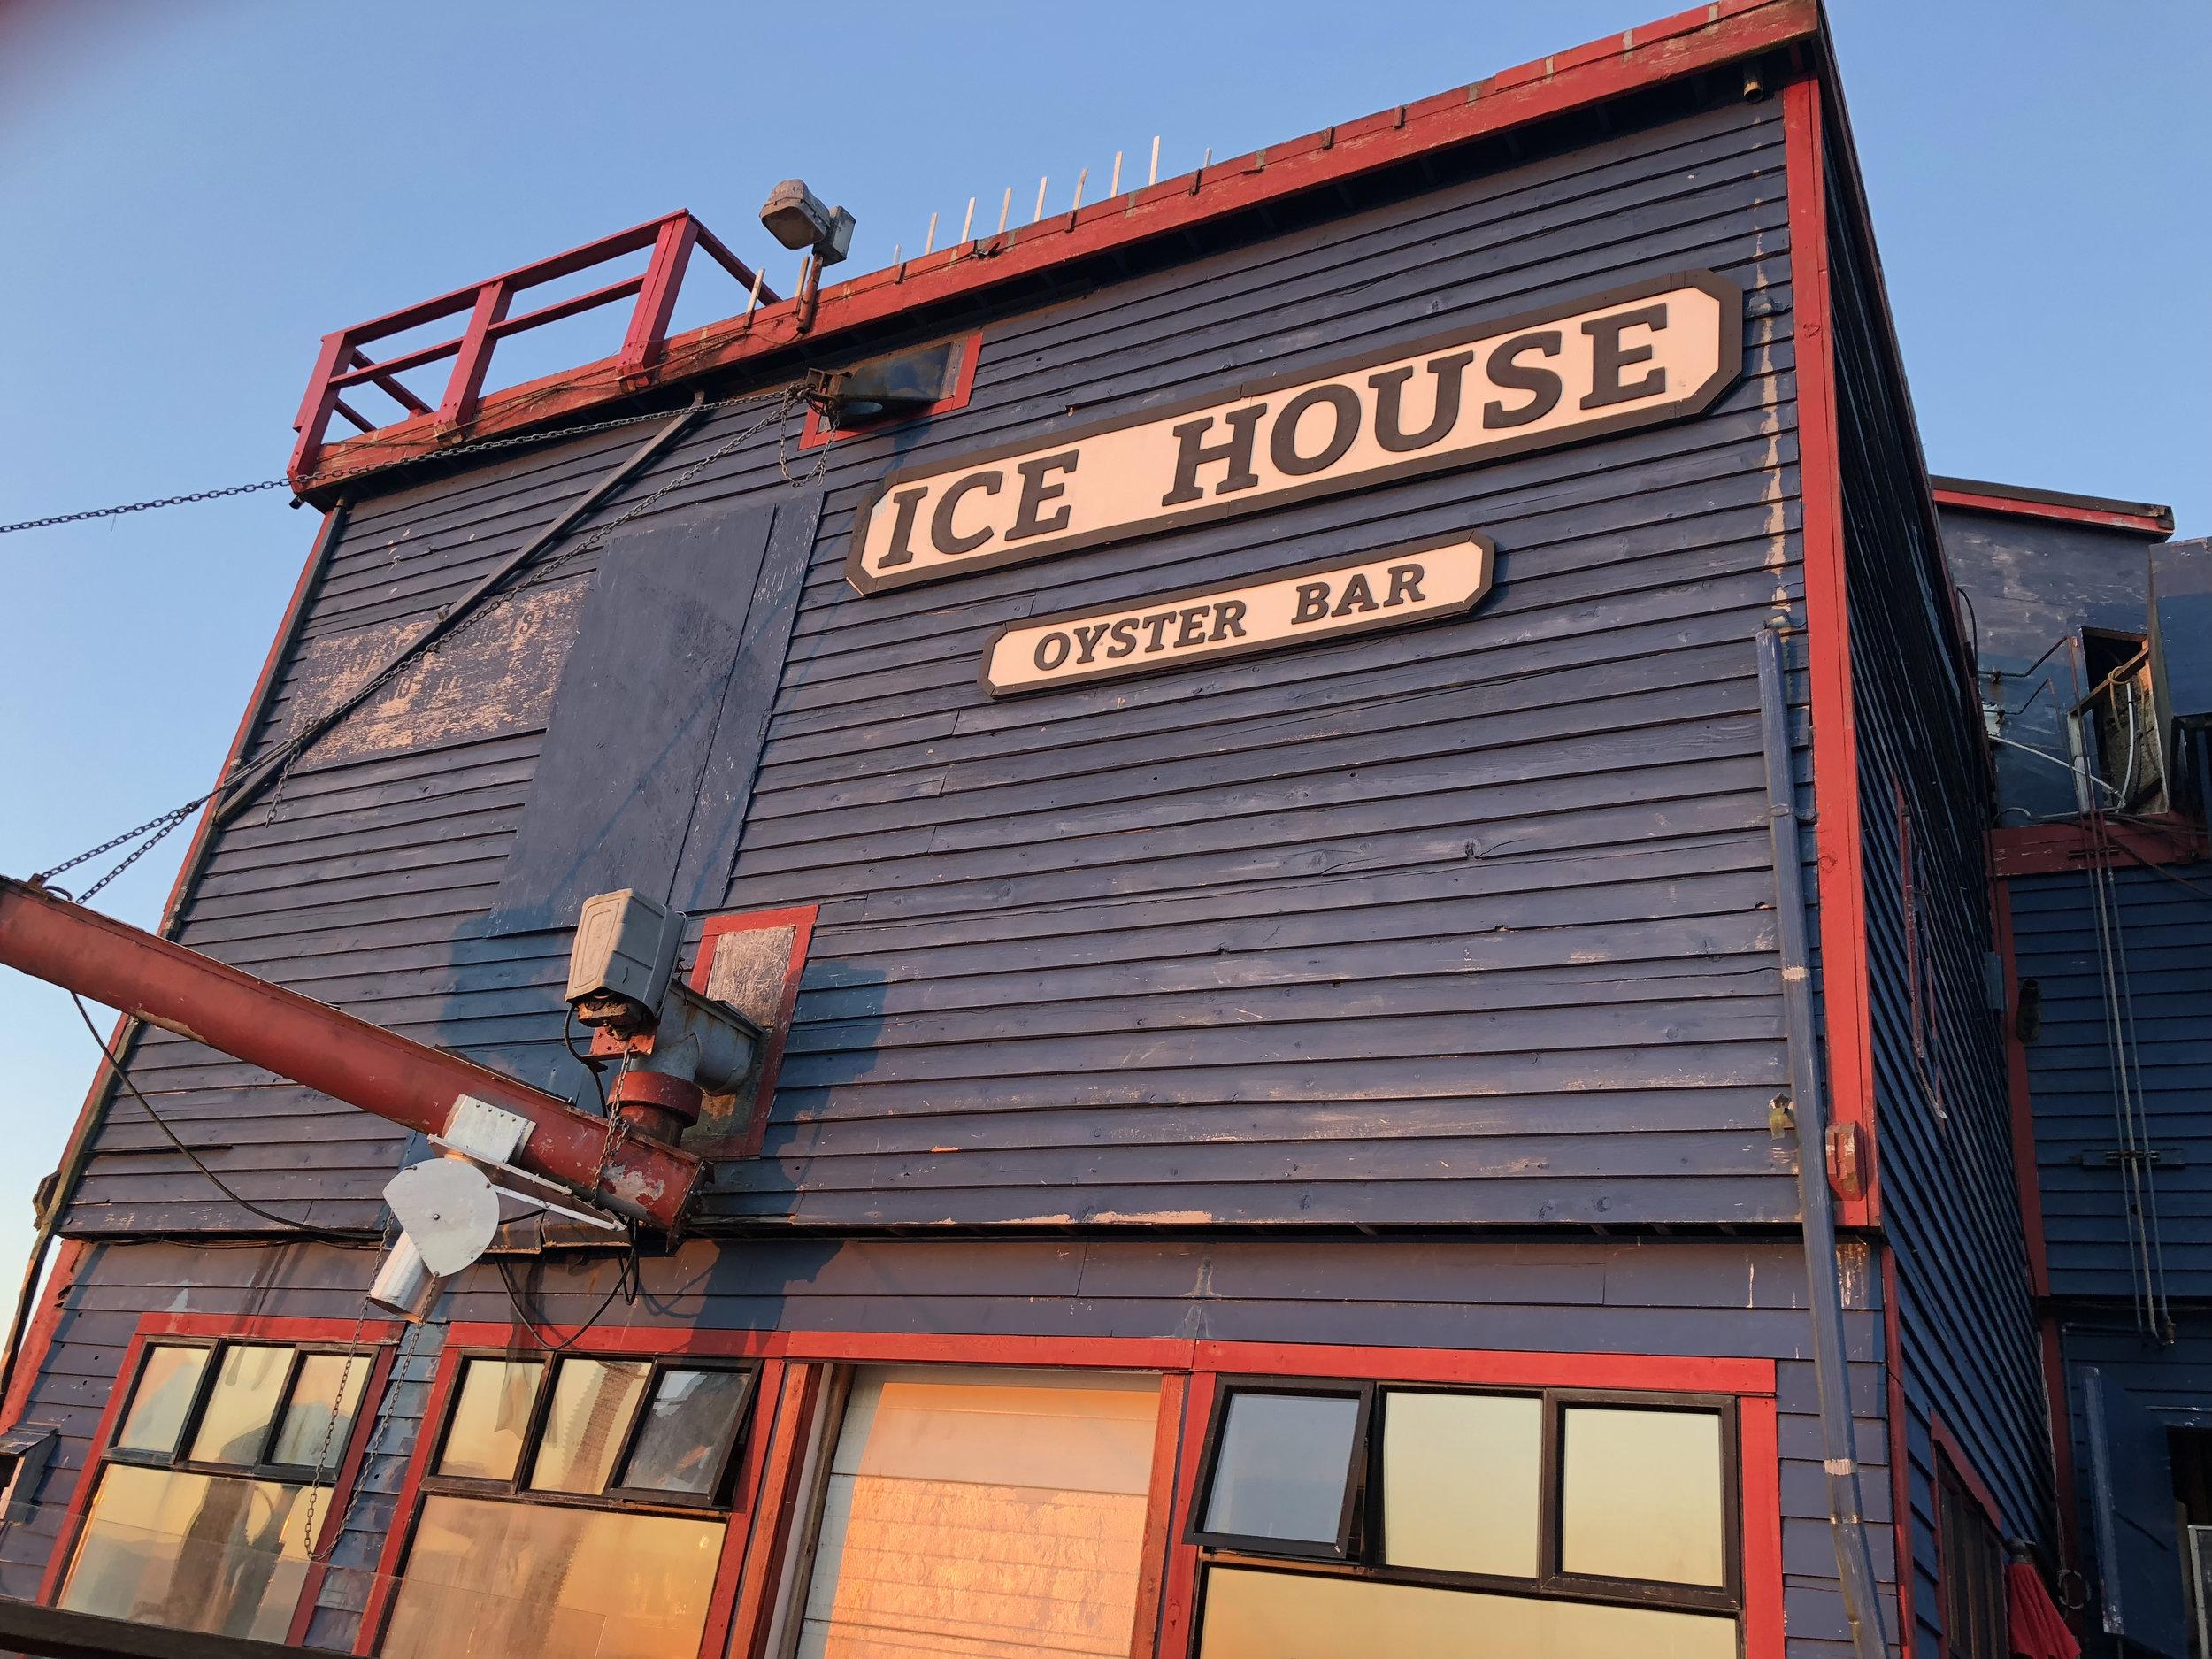 Icehouse Oyster Bar